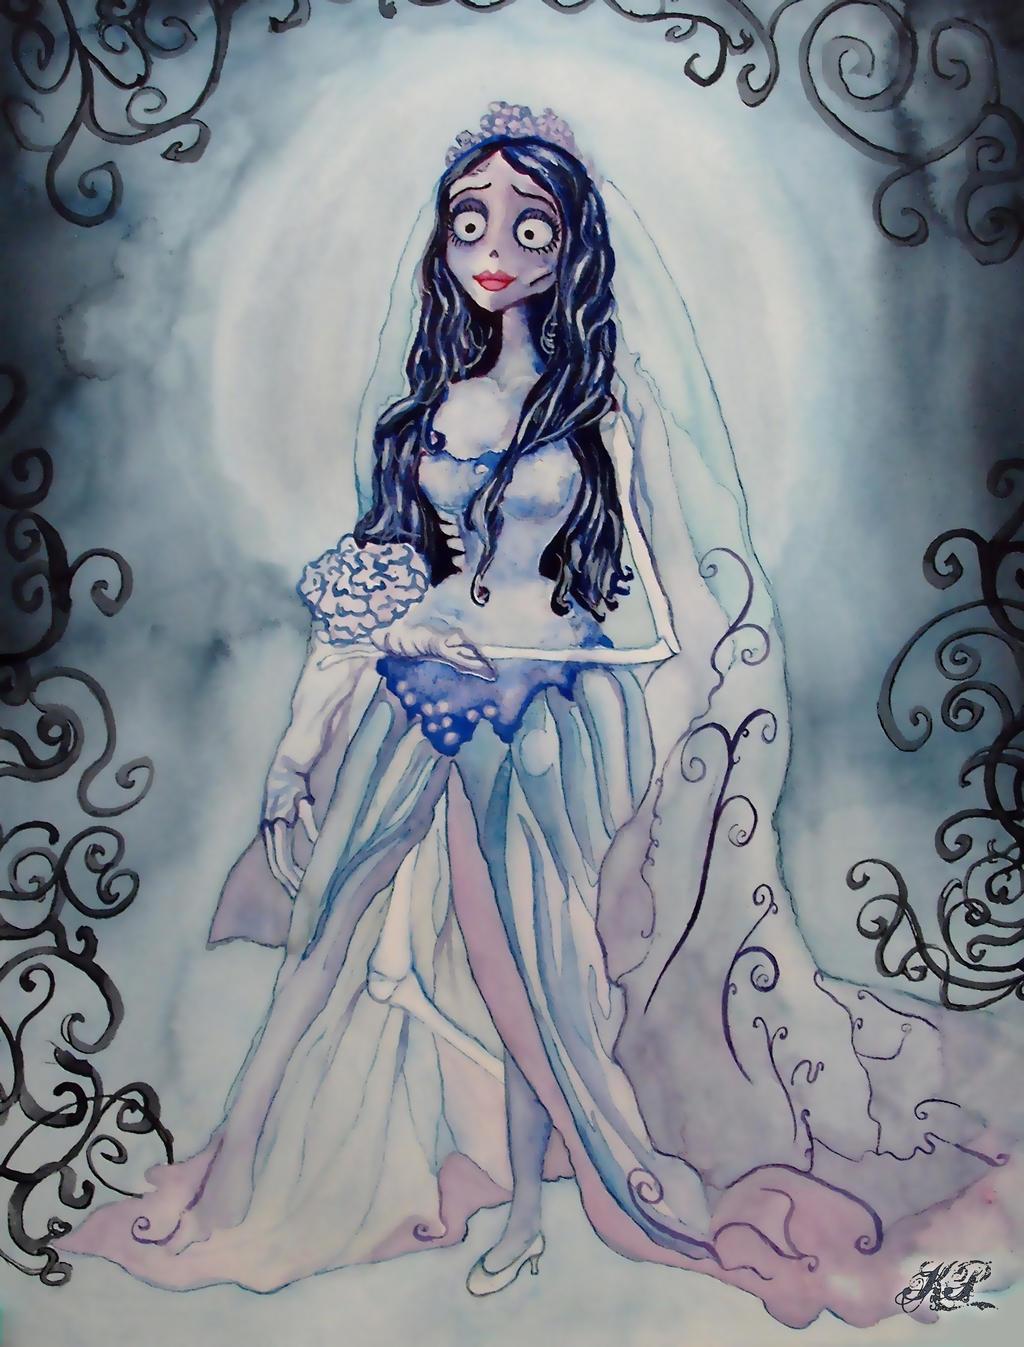 emily - corpse bride by Yildun27